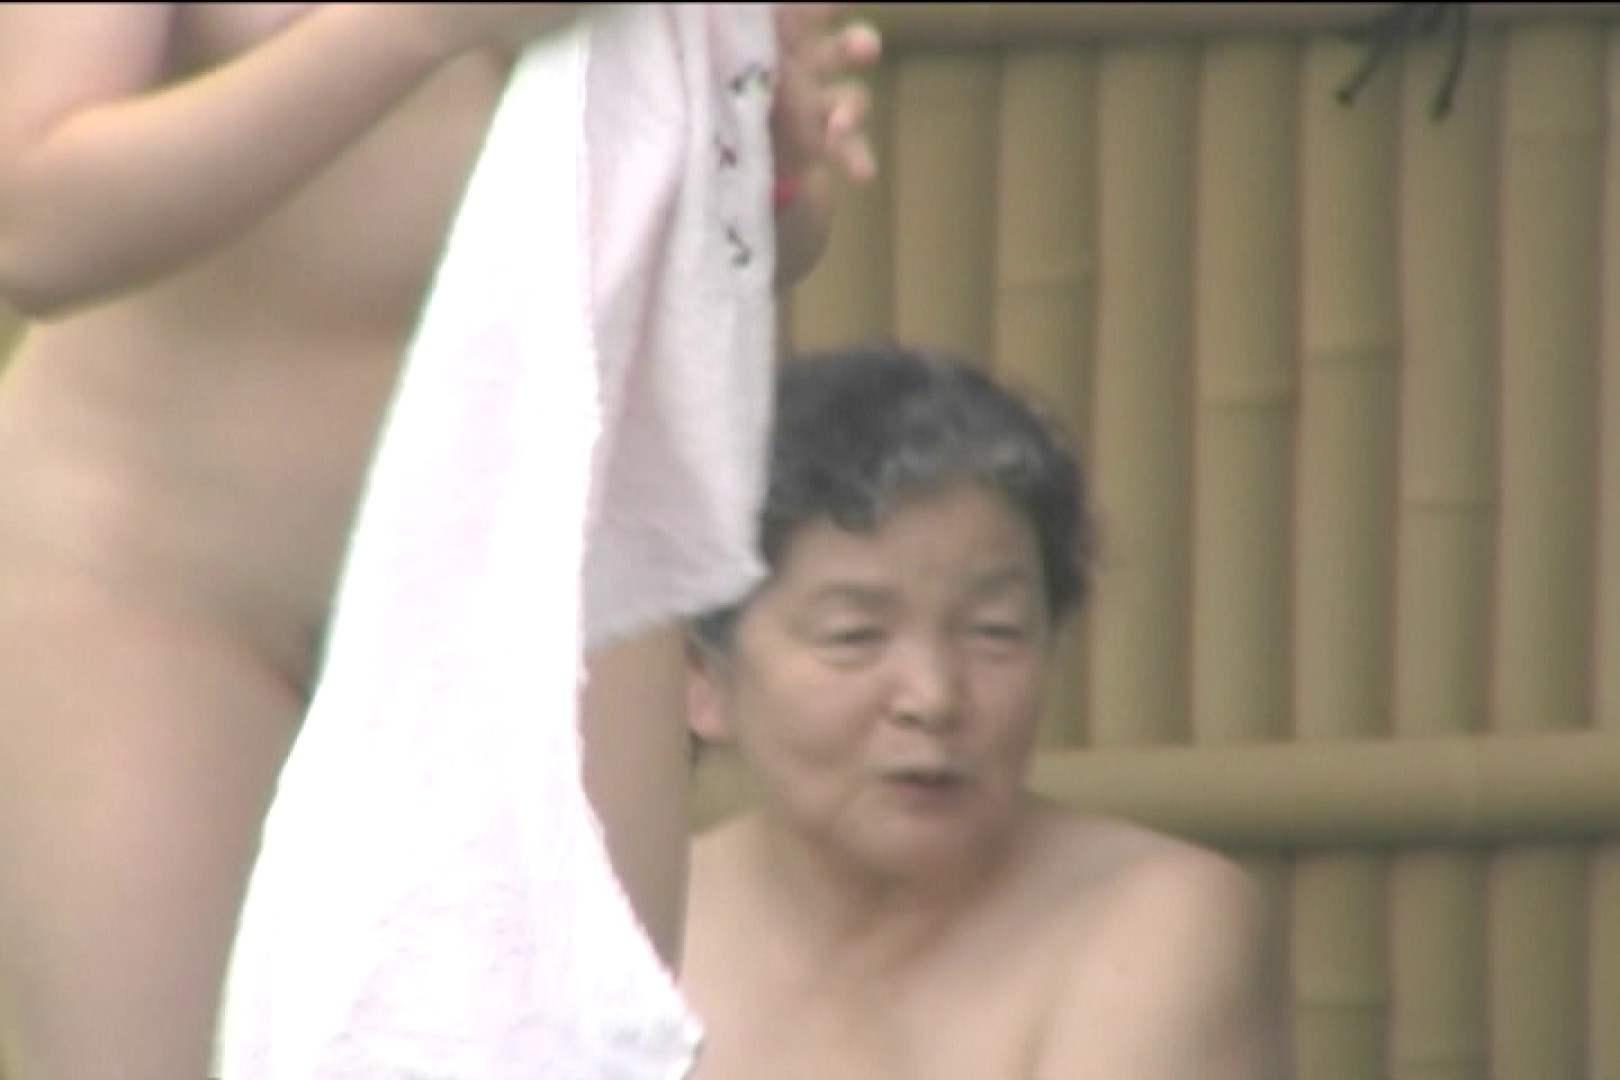 Aquaな露天風呂Vol.122 露天 | OL女体  77連発 46